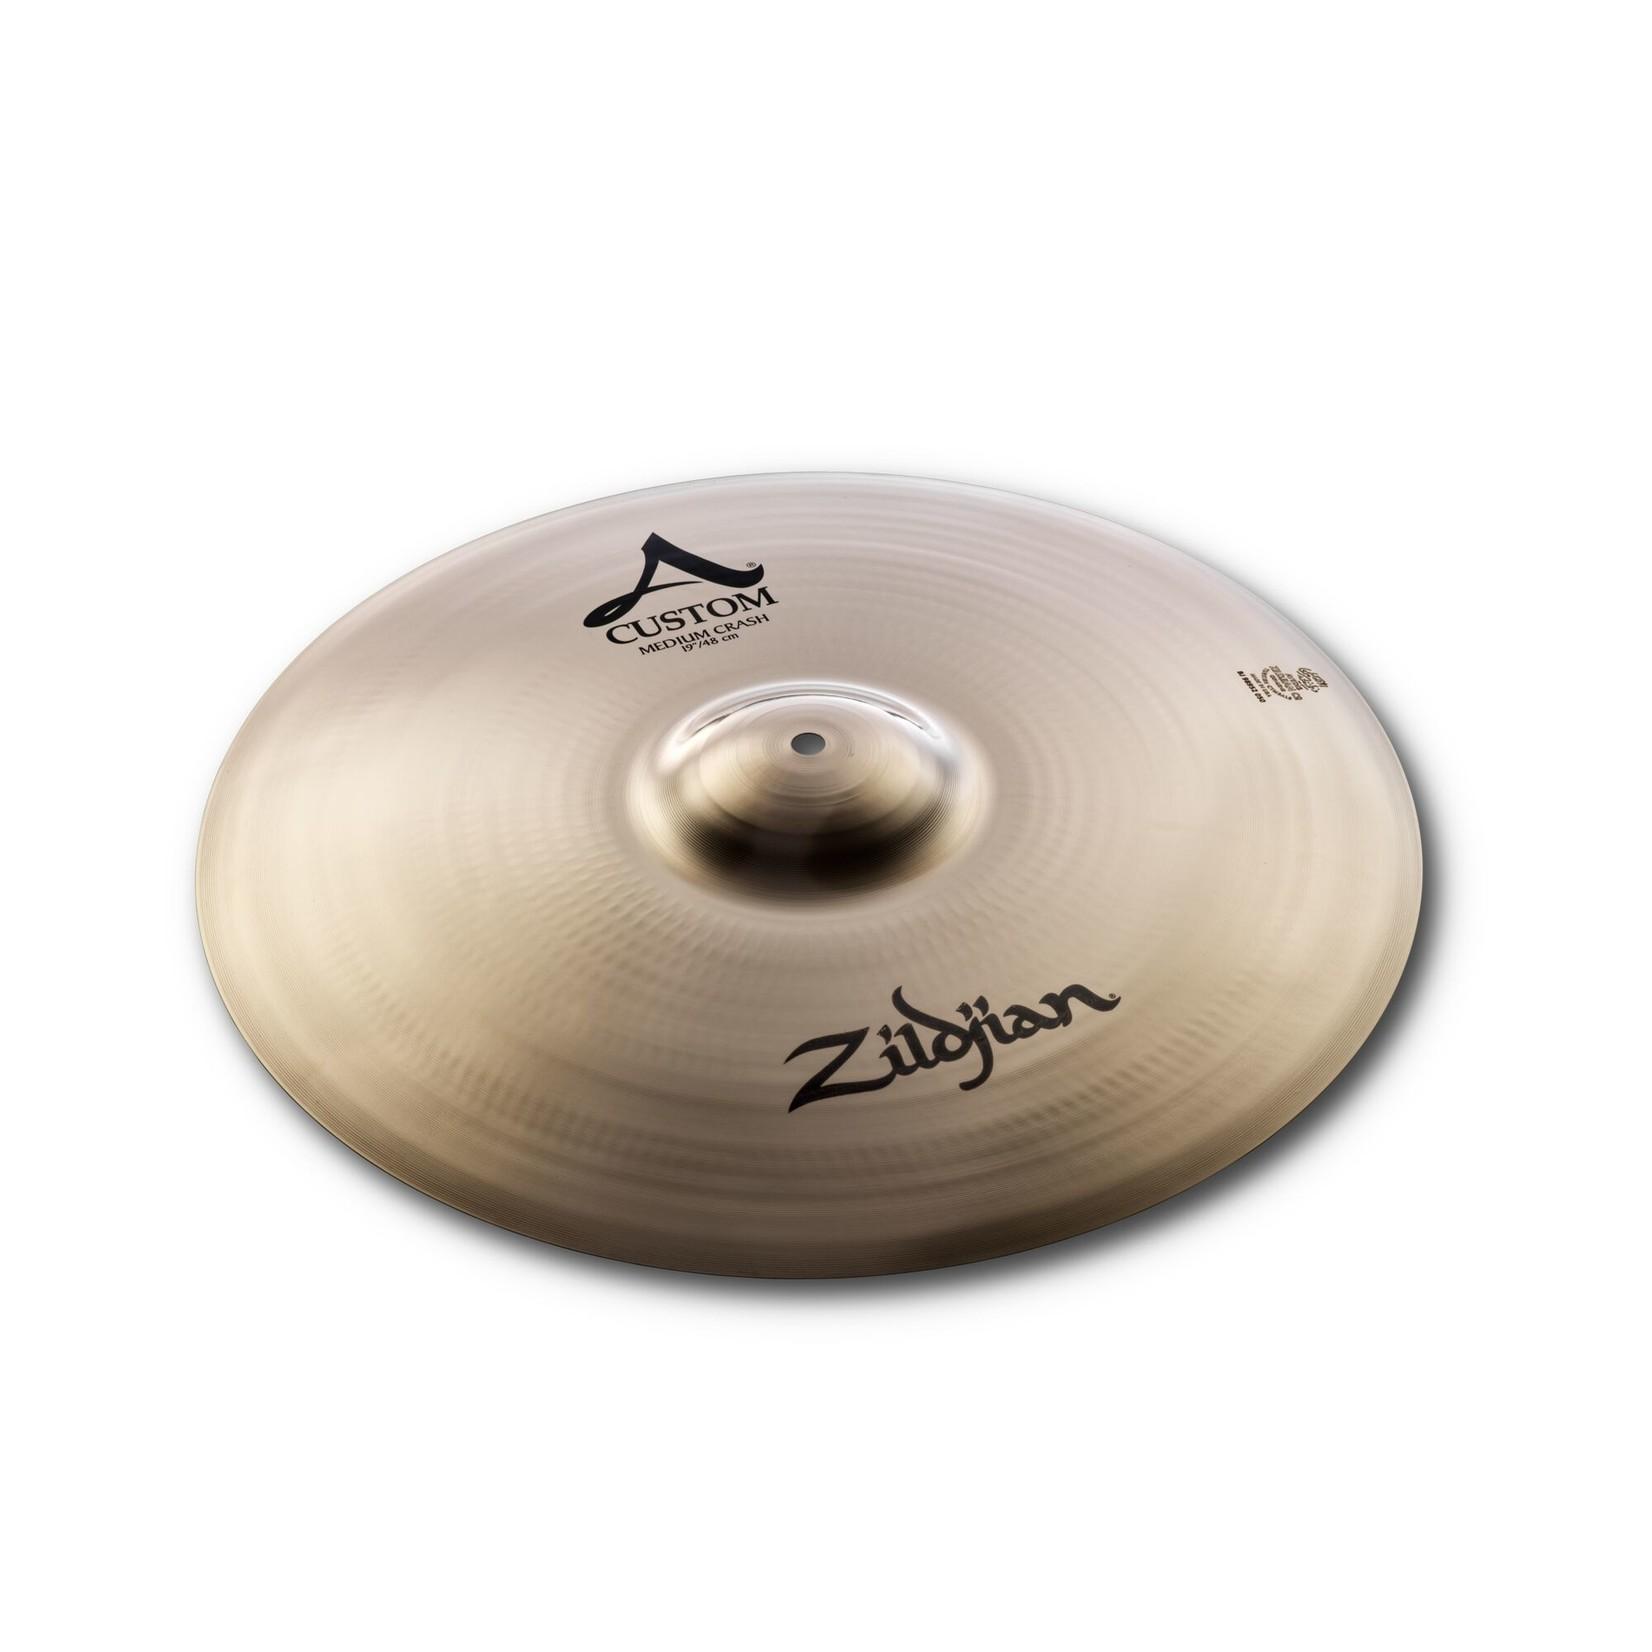 Zildjian Zildjian 19'' A Custom Medium Crash